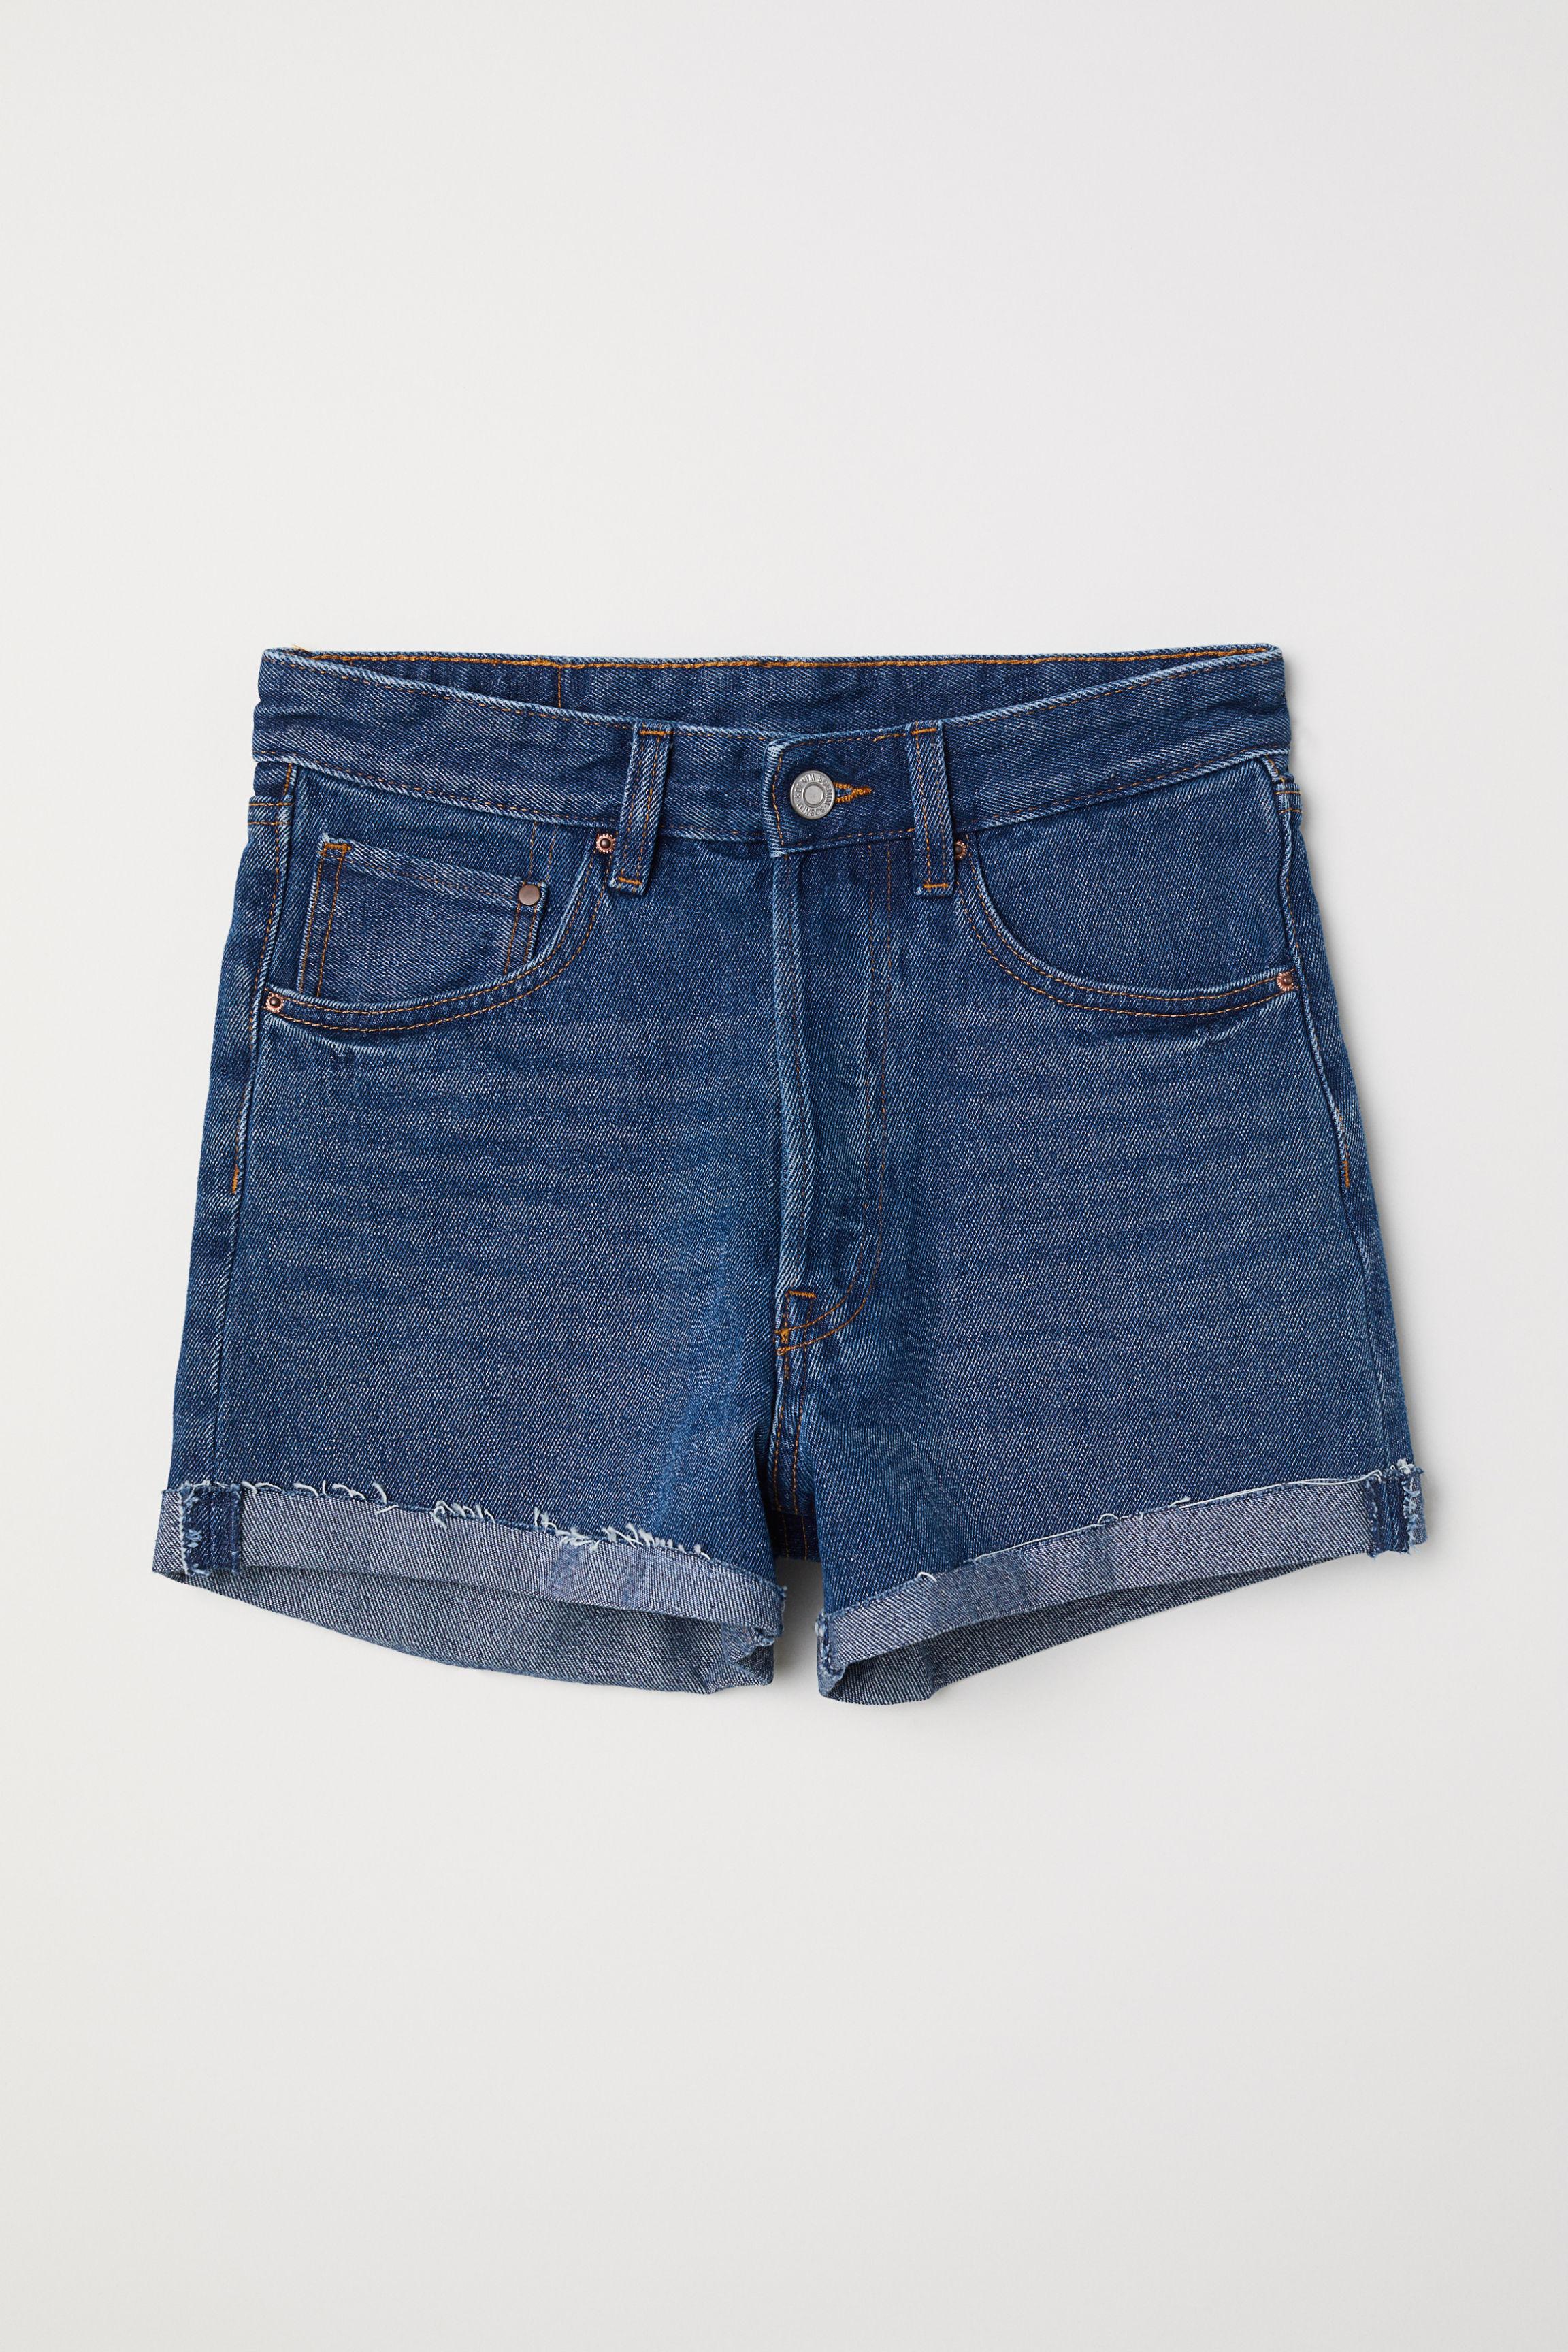 e265f9e771 Mom Fit Denim Shorts - Denim blue/trashed - Ladies | H&M US